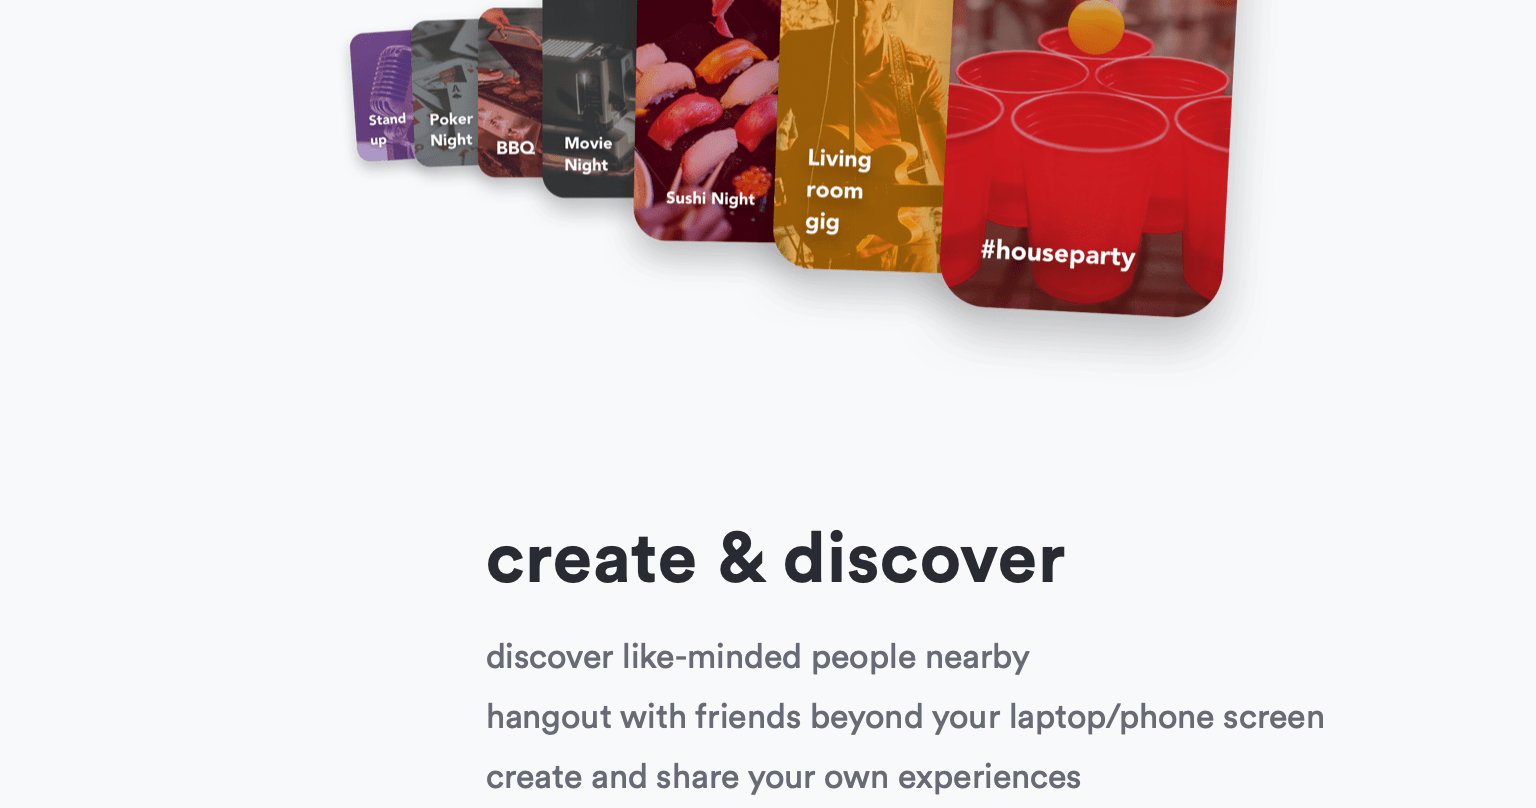 A blurb from the Lemonade Social App